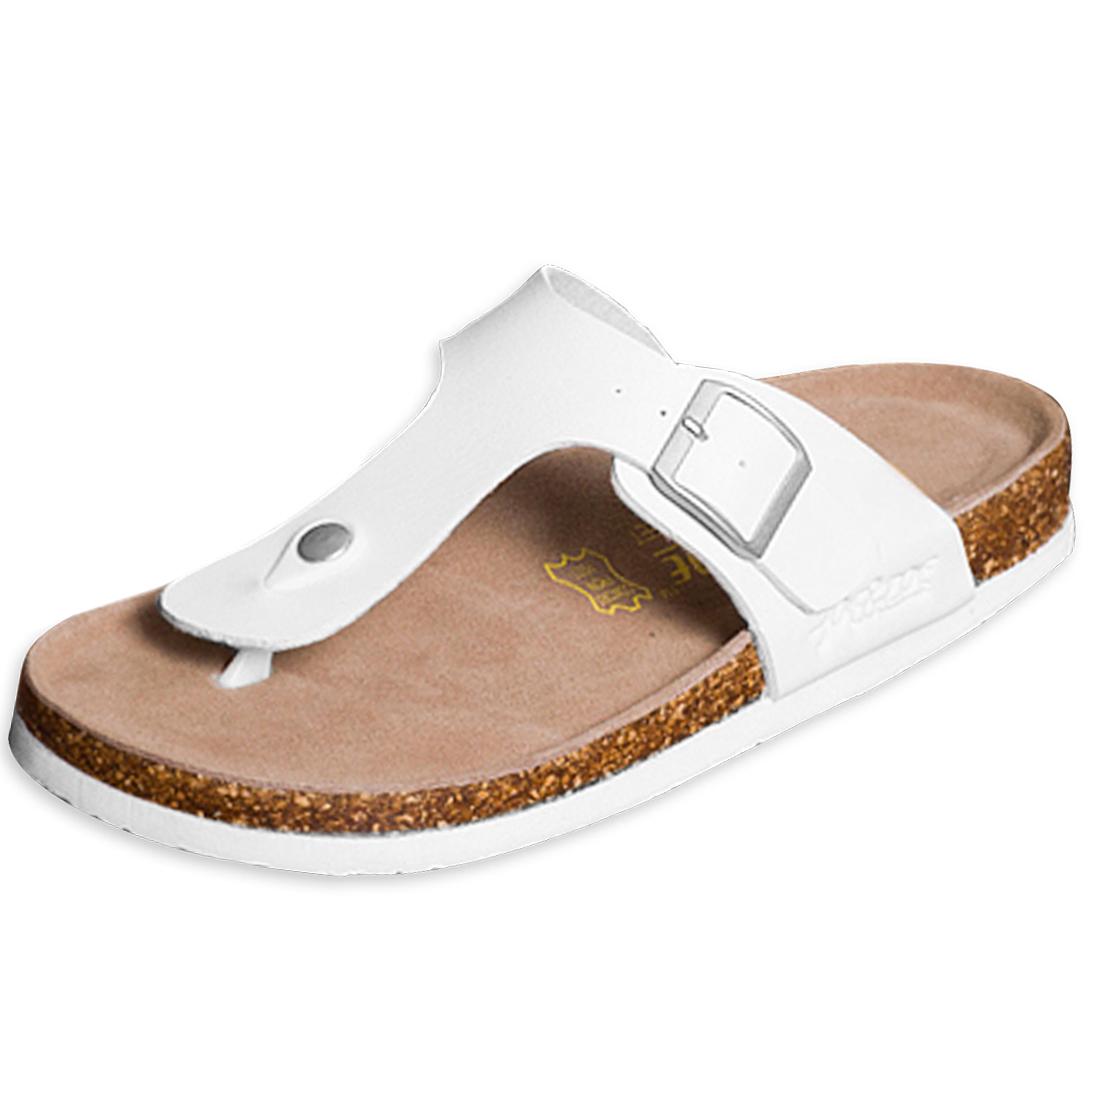 White US Size 6.5 Flexible Strap Featuring Buckle Men Sandal